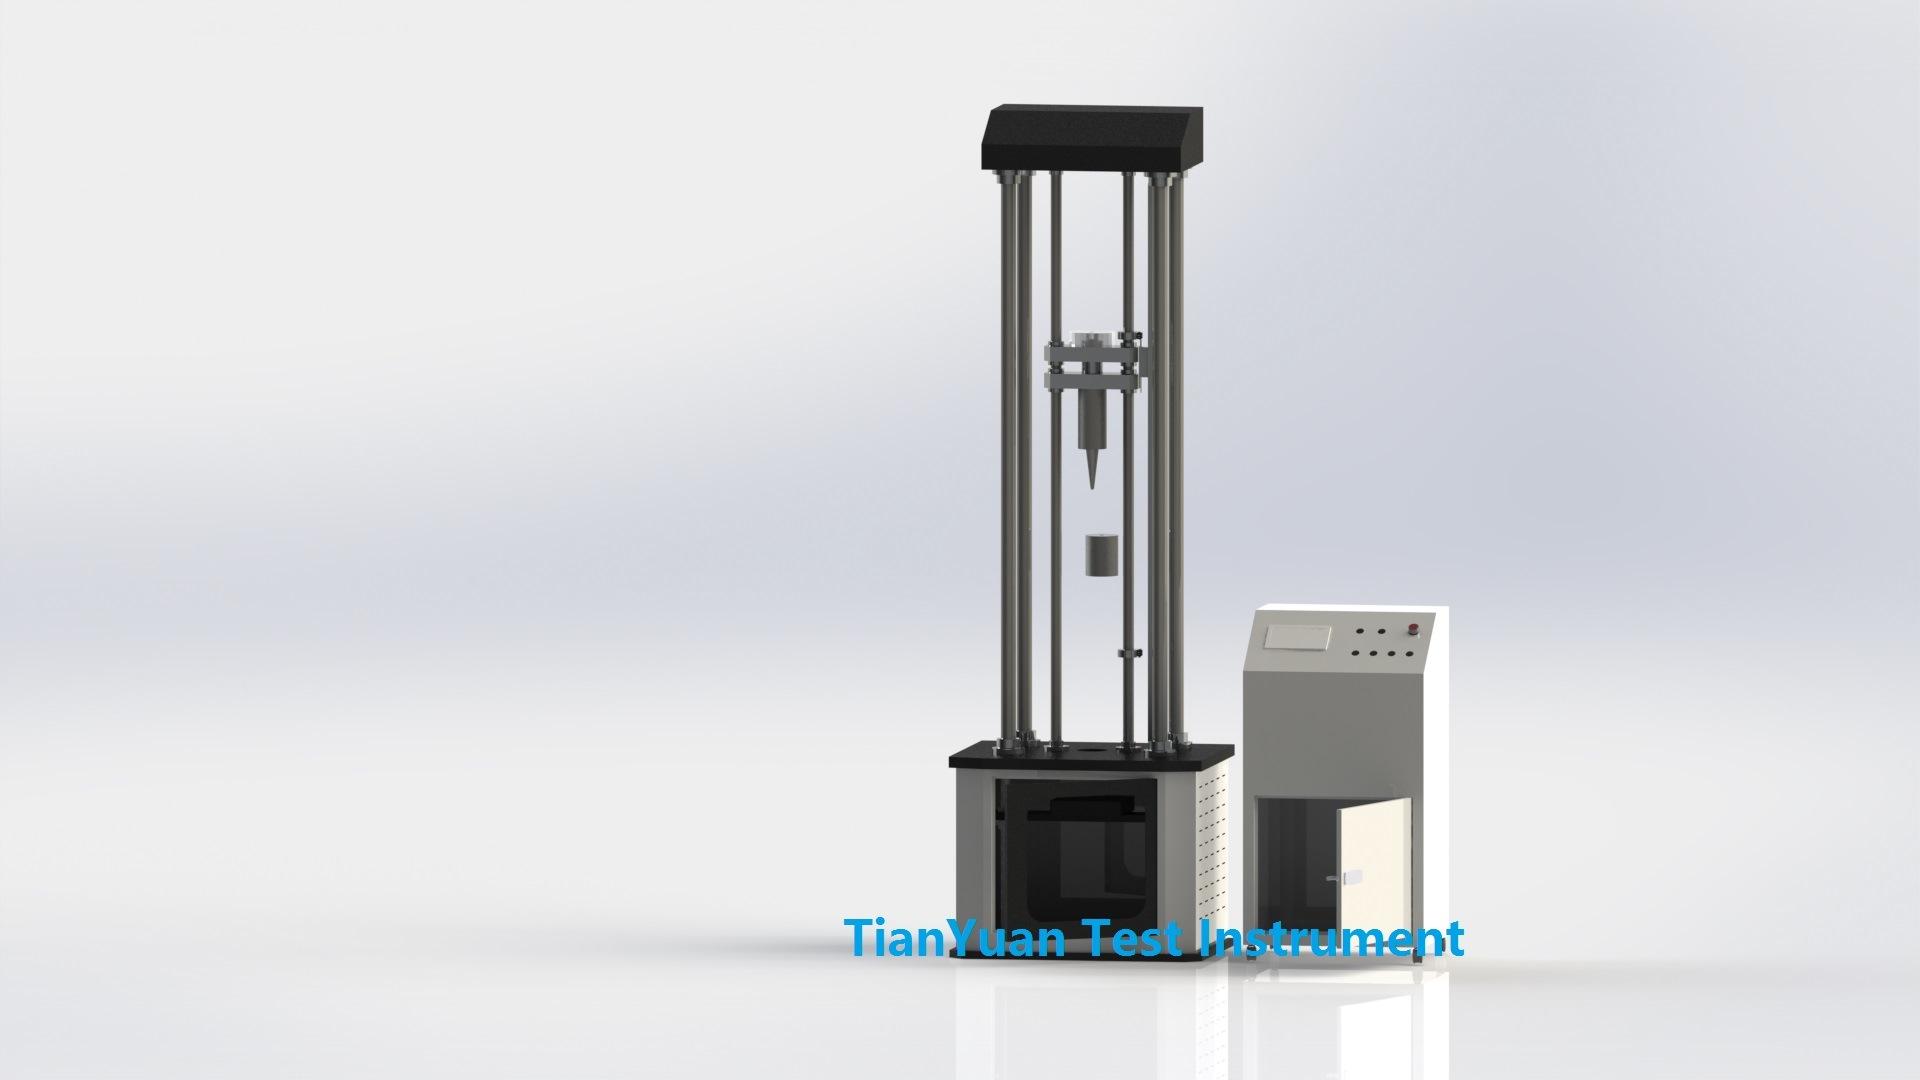 Ty-8008 Automatic Drop Hammer Testing Machine/Equipment